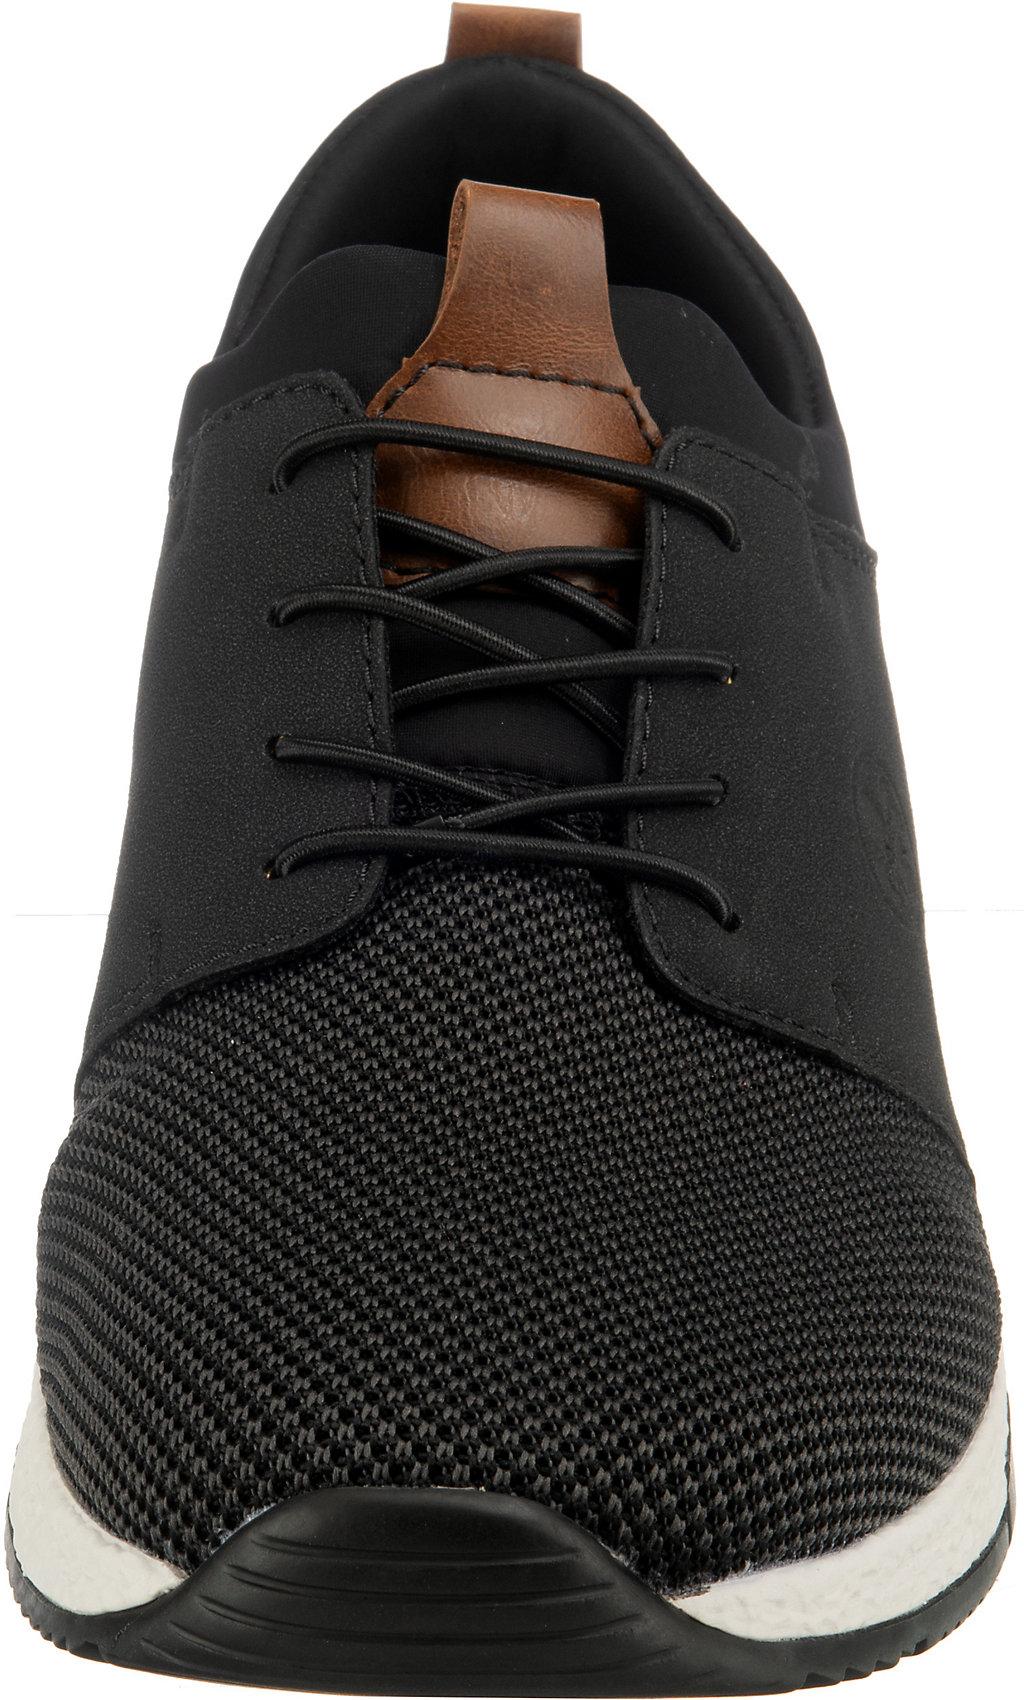 Indexbild 10 - Neu rieker Sneakers Low 12842477 für Herren schwarz